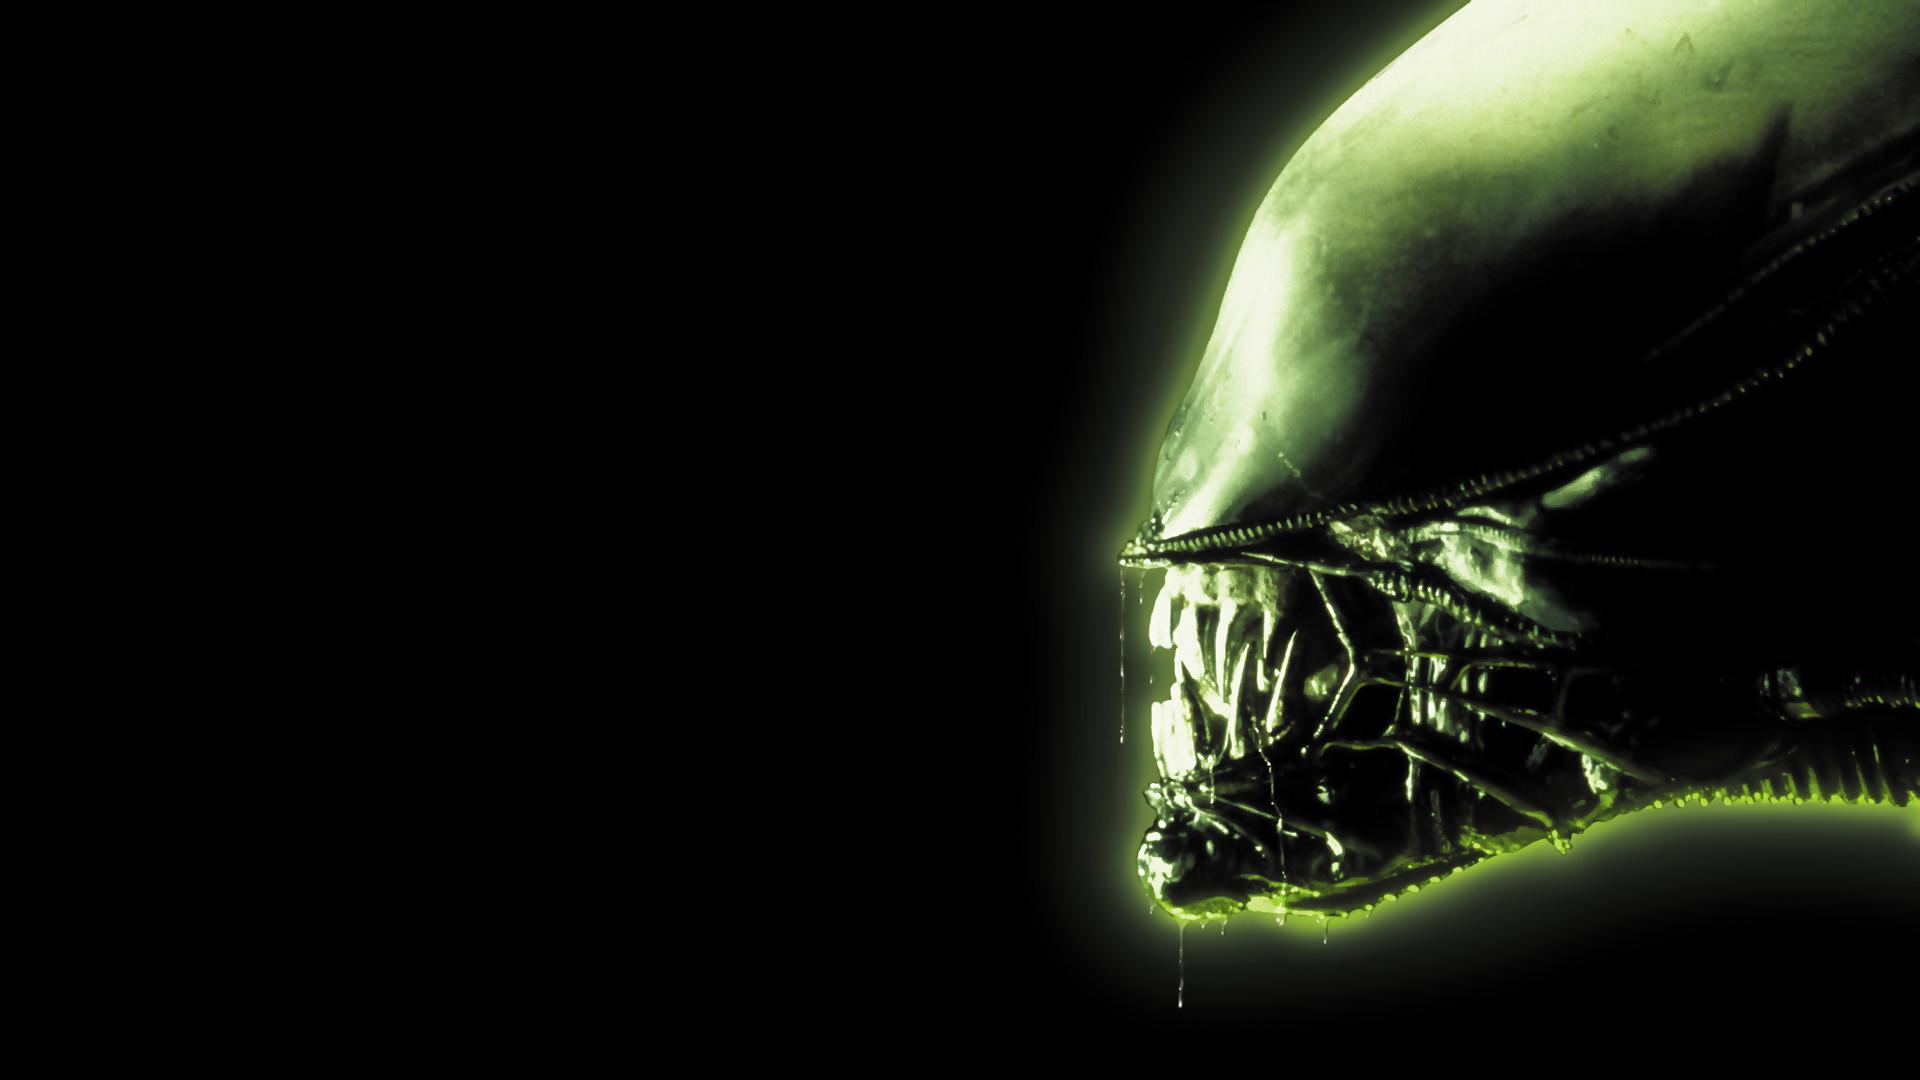 Aliens Movie Wallpaper 1920x1080 Aliens Movie 1920x1080